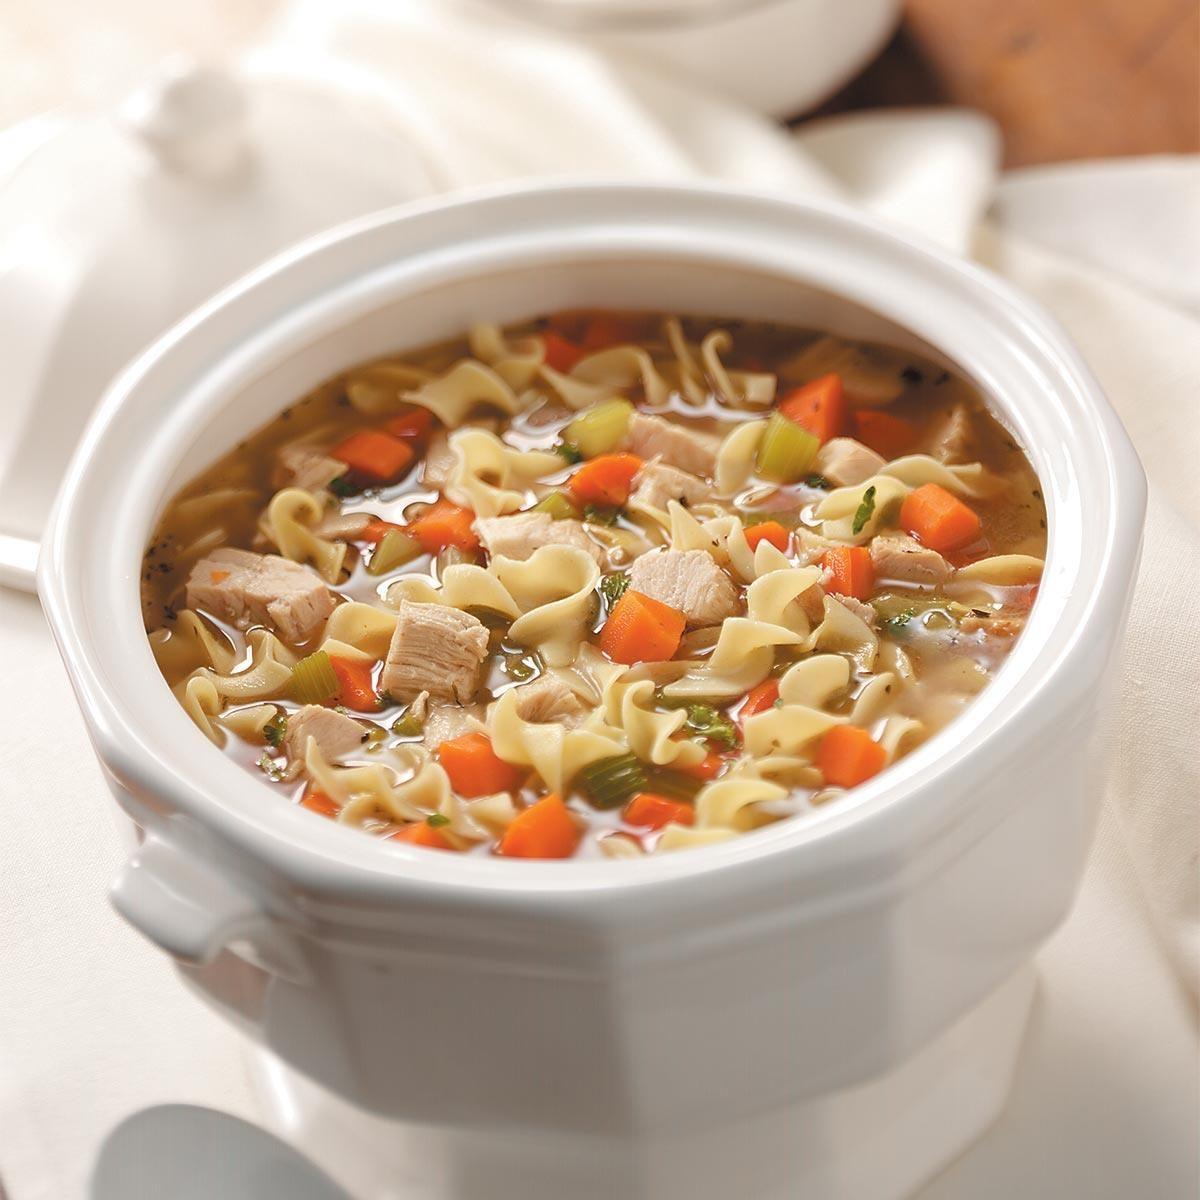 Old-Fashioned Turkey Noodle Soup Recipe